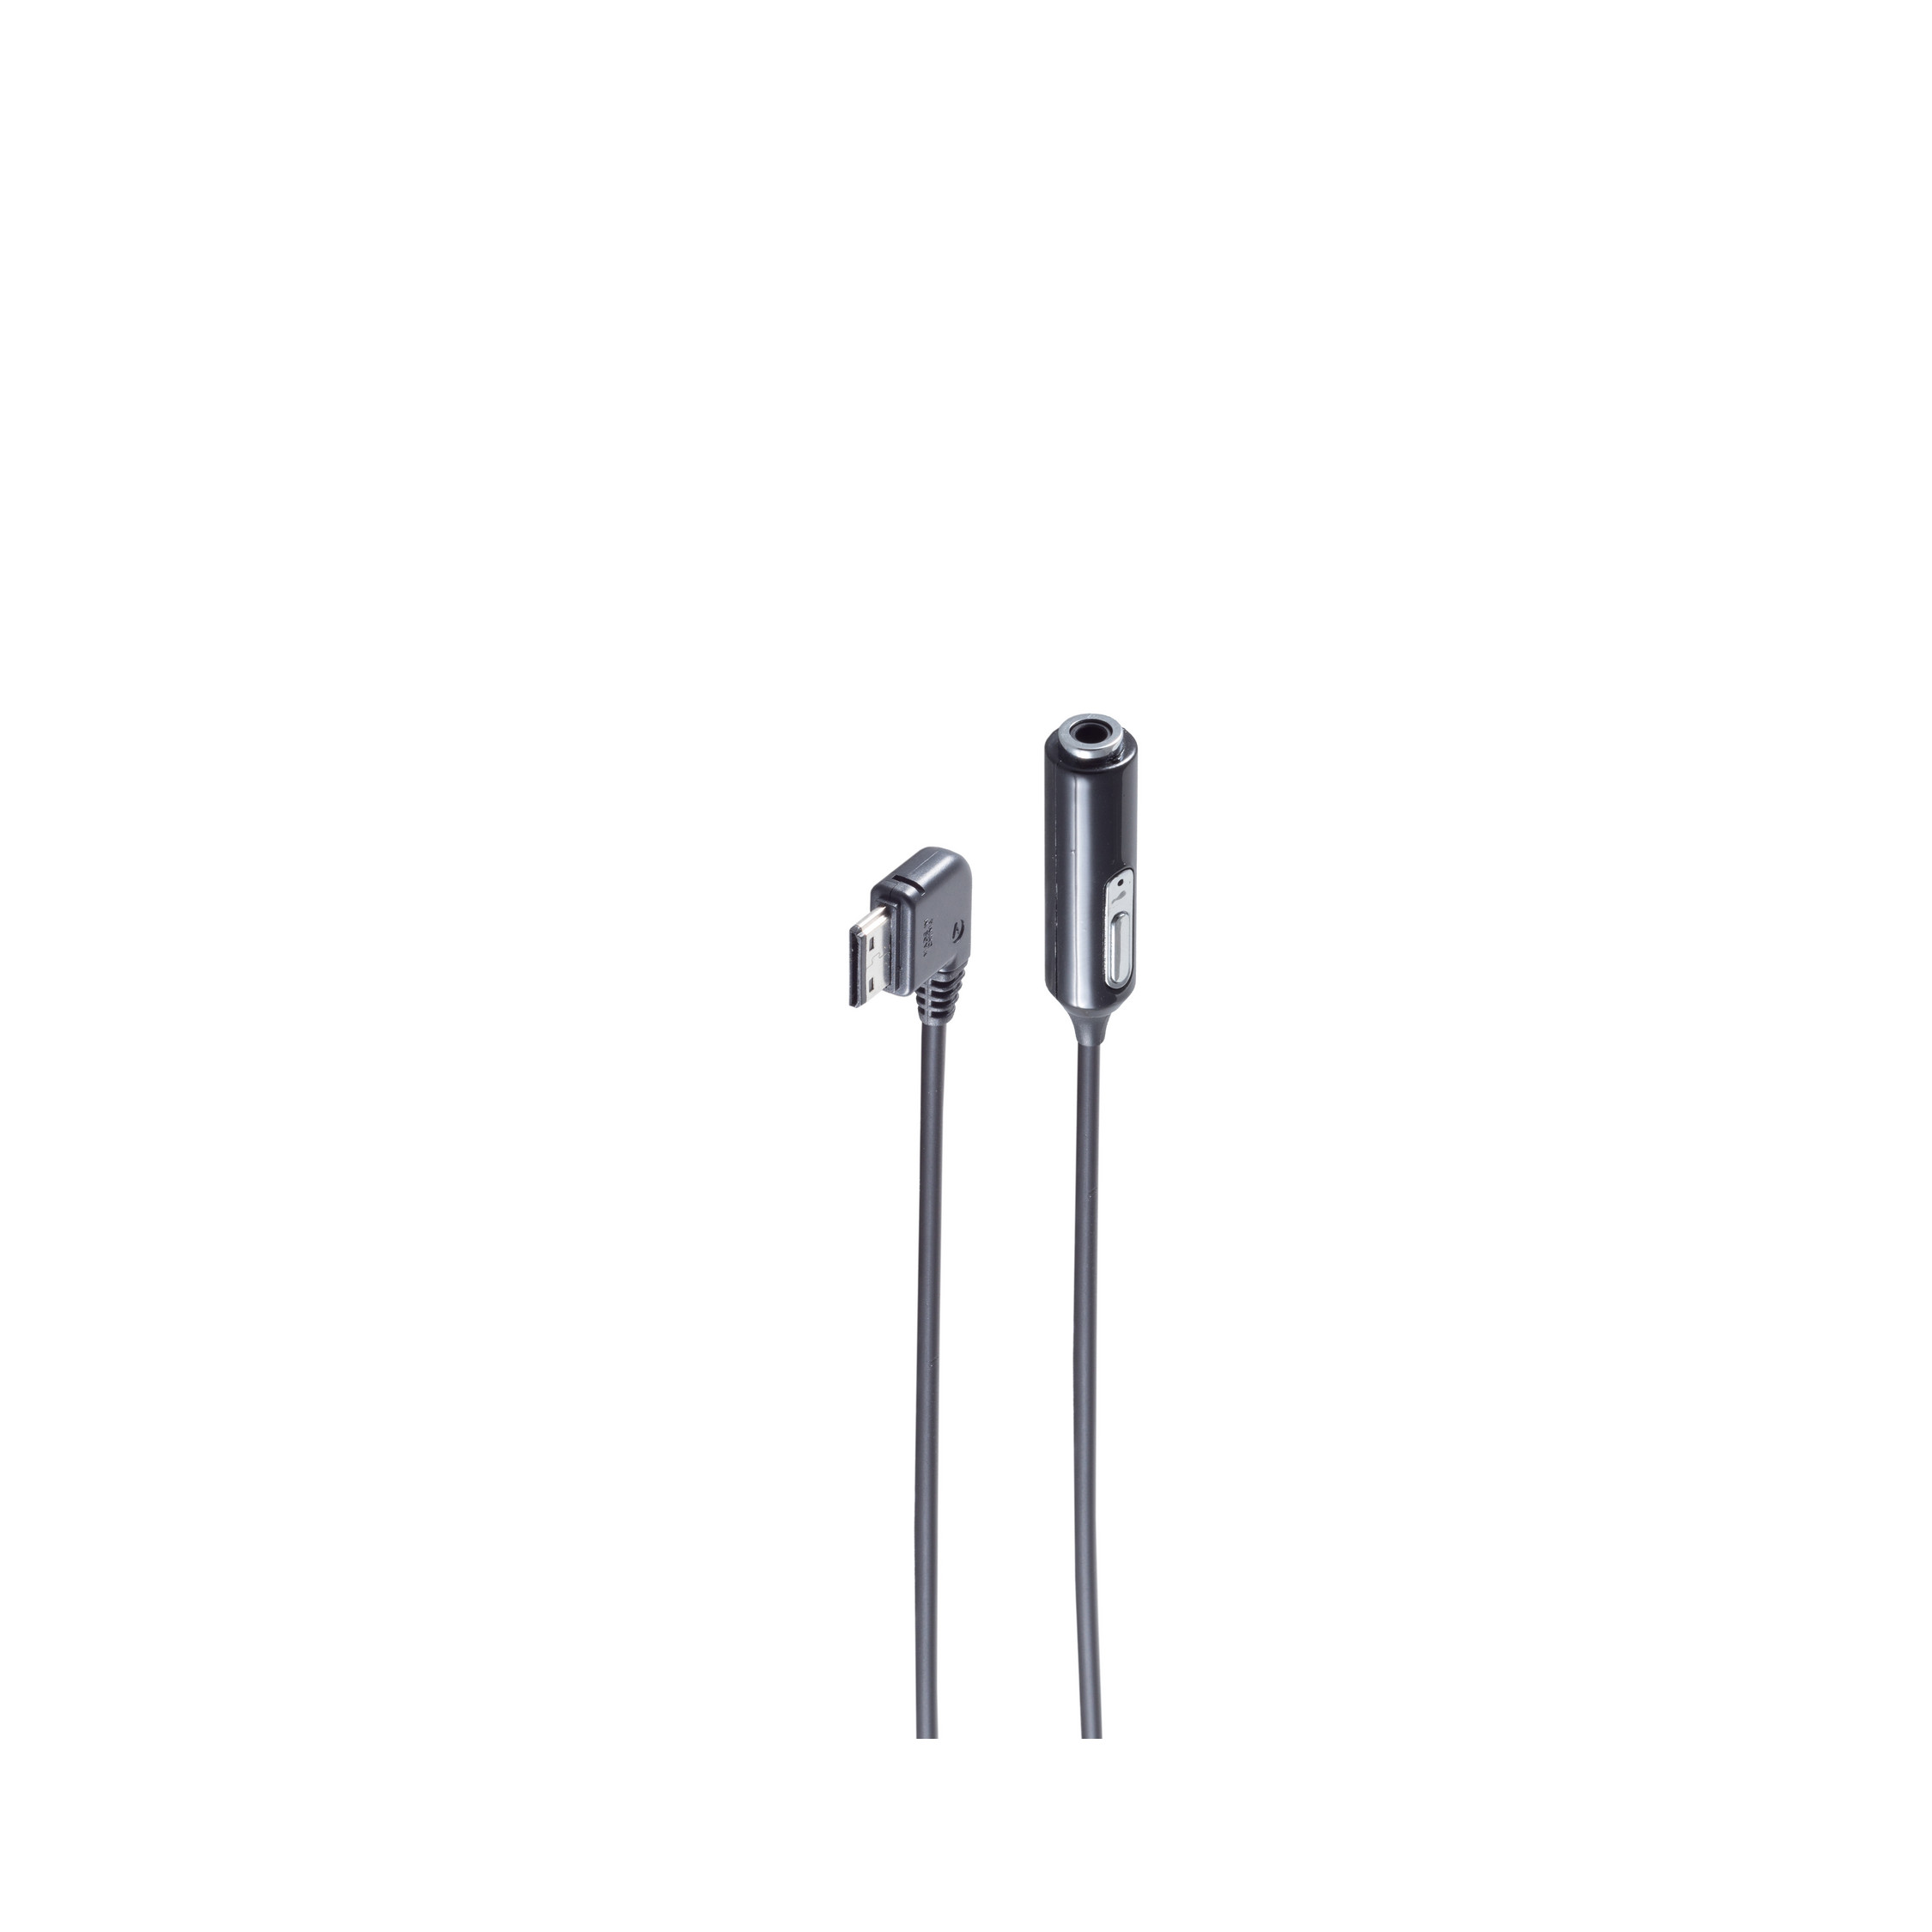 shiverpeaks BASIC-S Audio-Adapter 3,5 mm Klinkenstecker